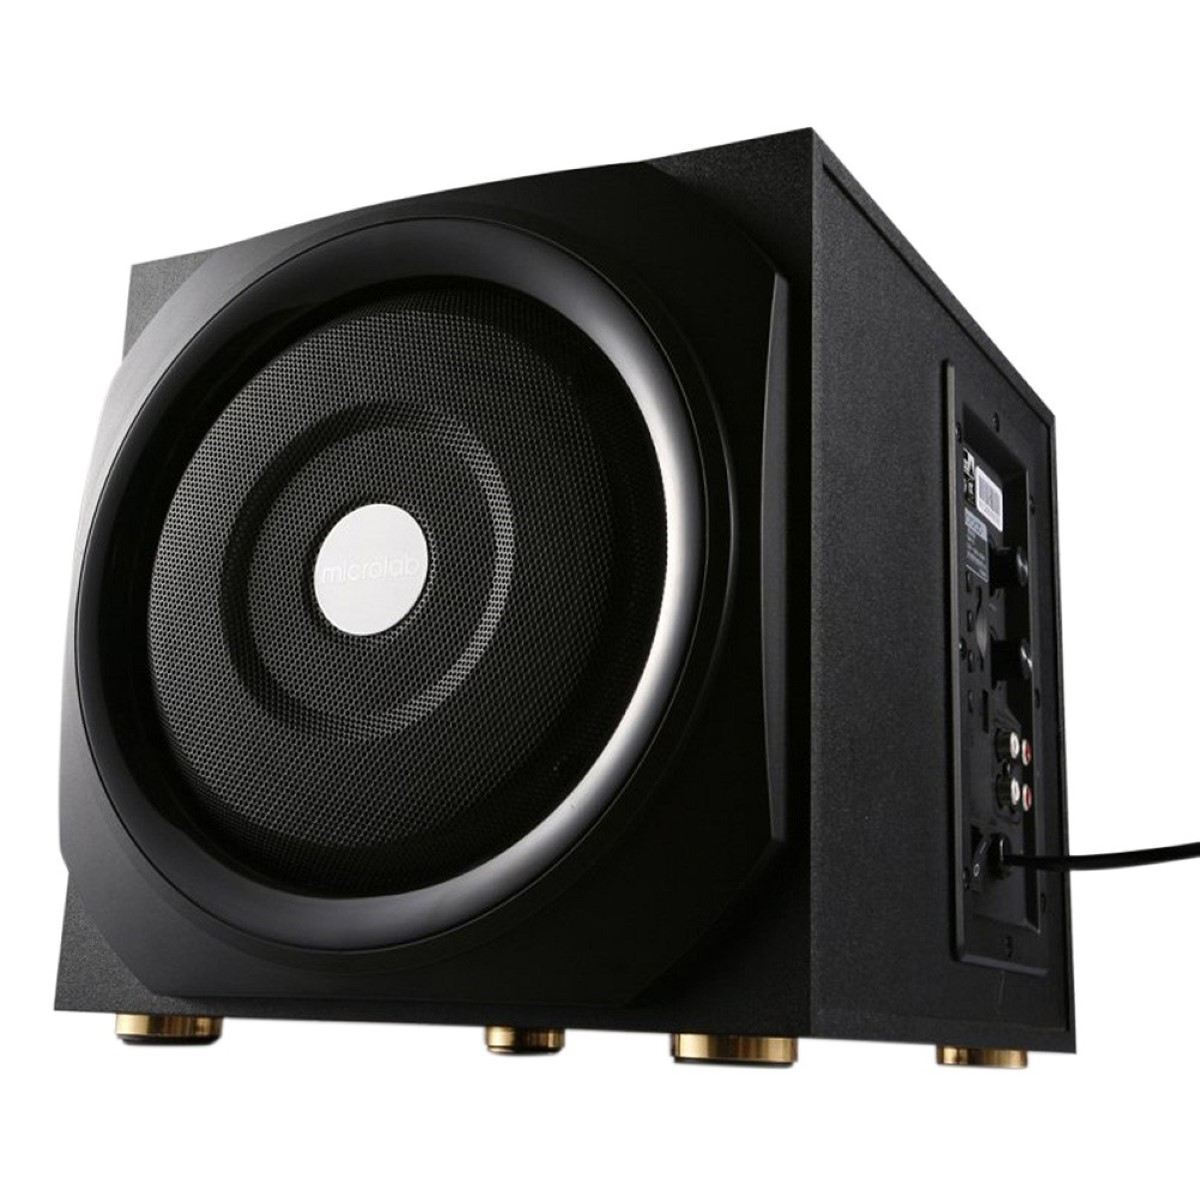 Loa vi tính Microlab TMN9-BT Bluetooth 2.1 2